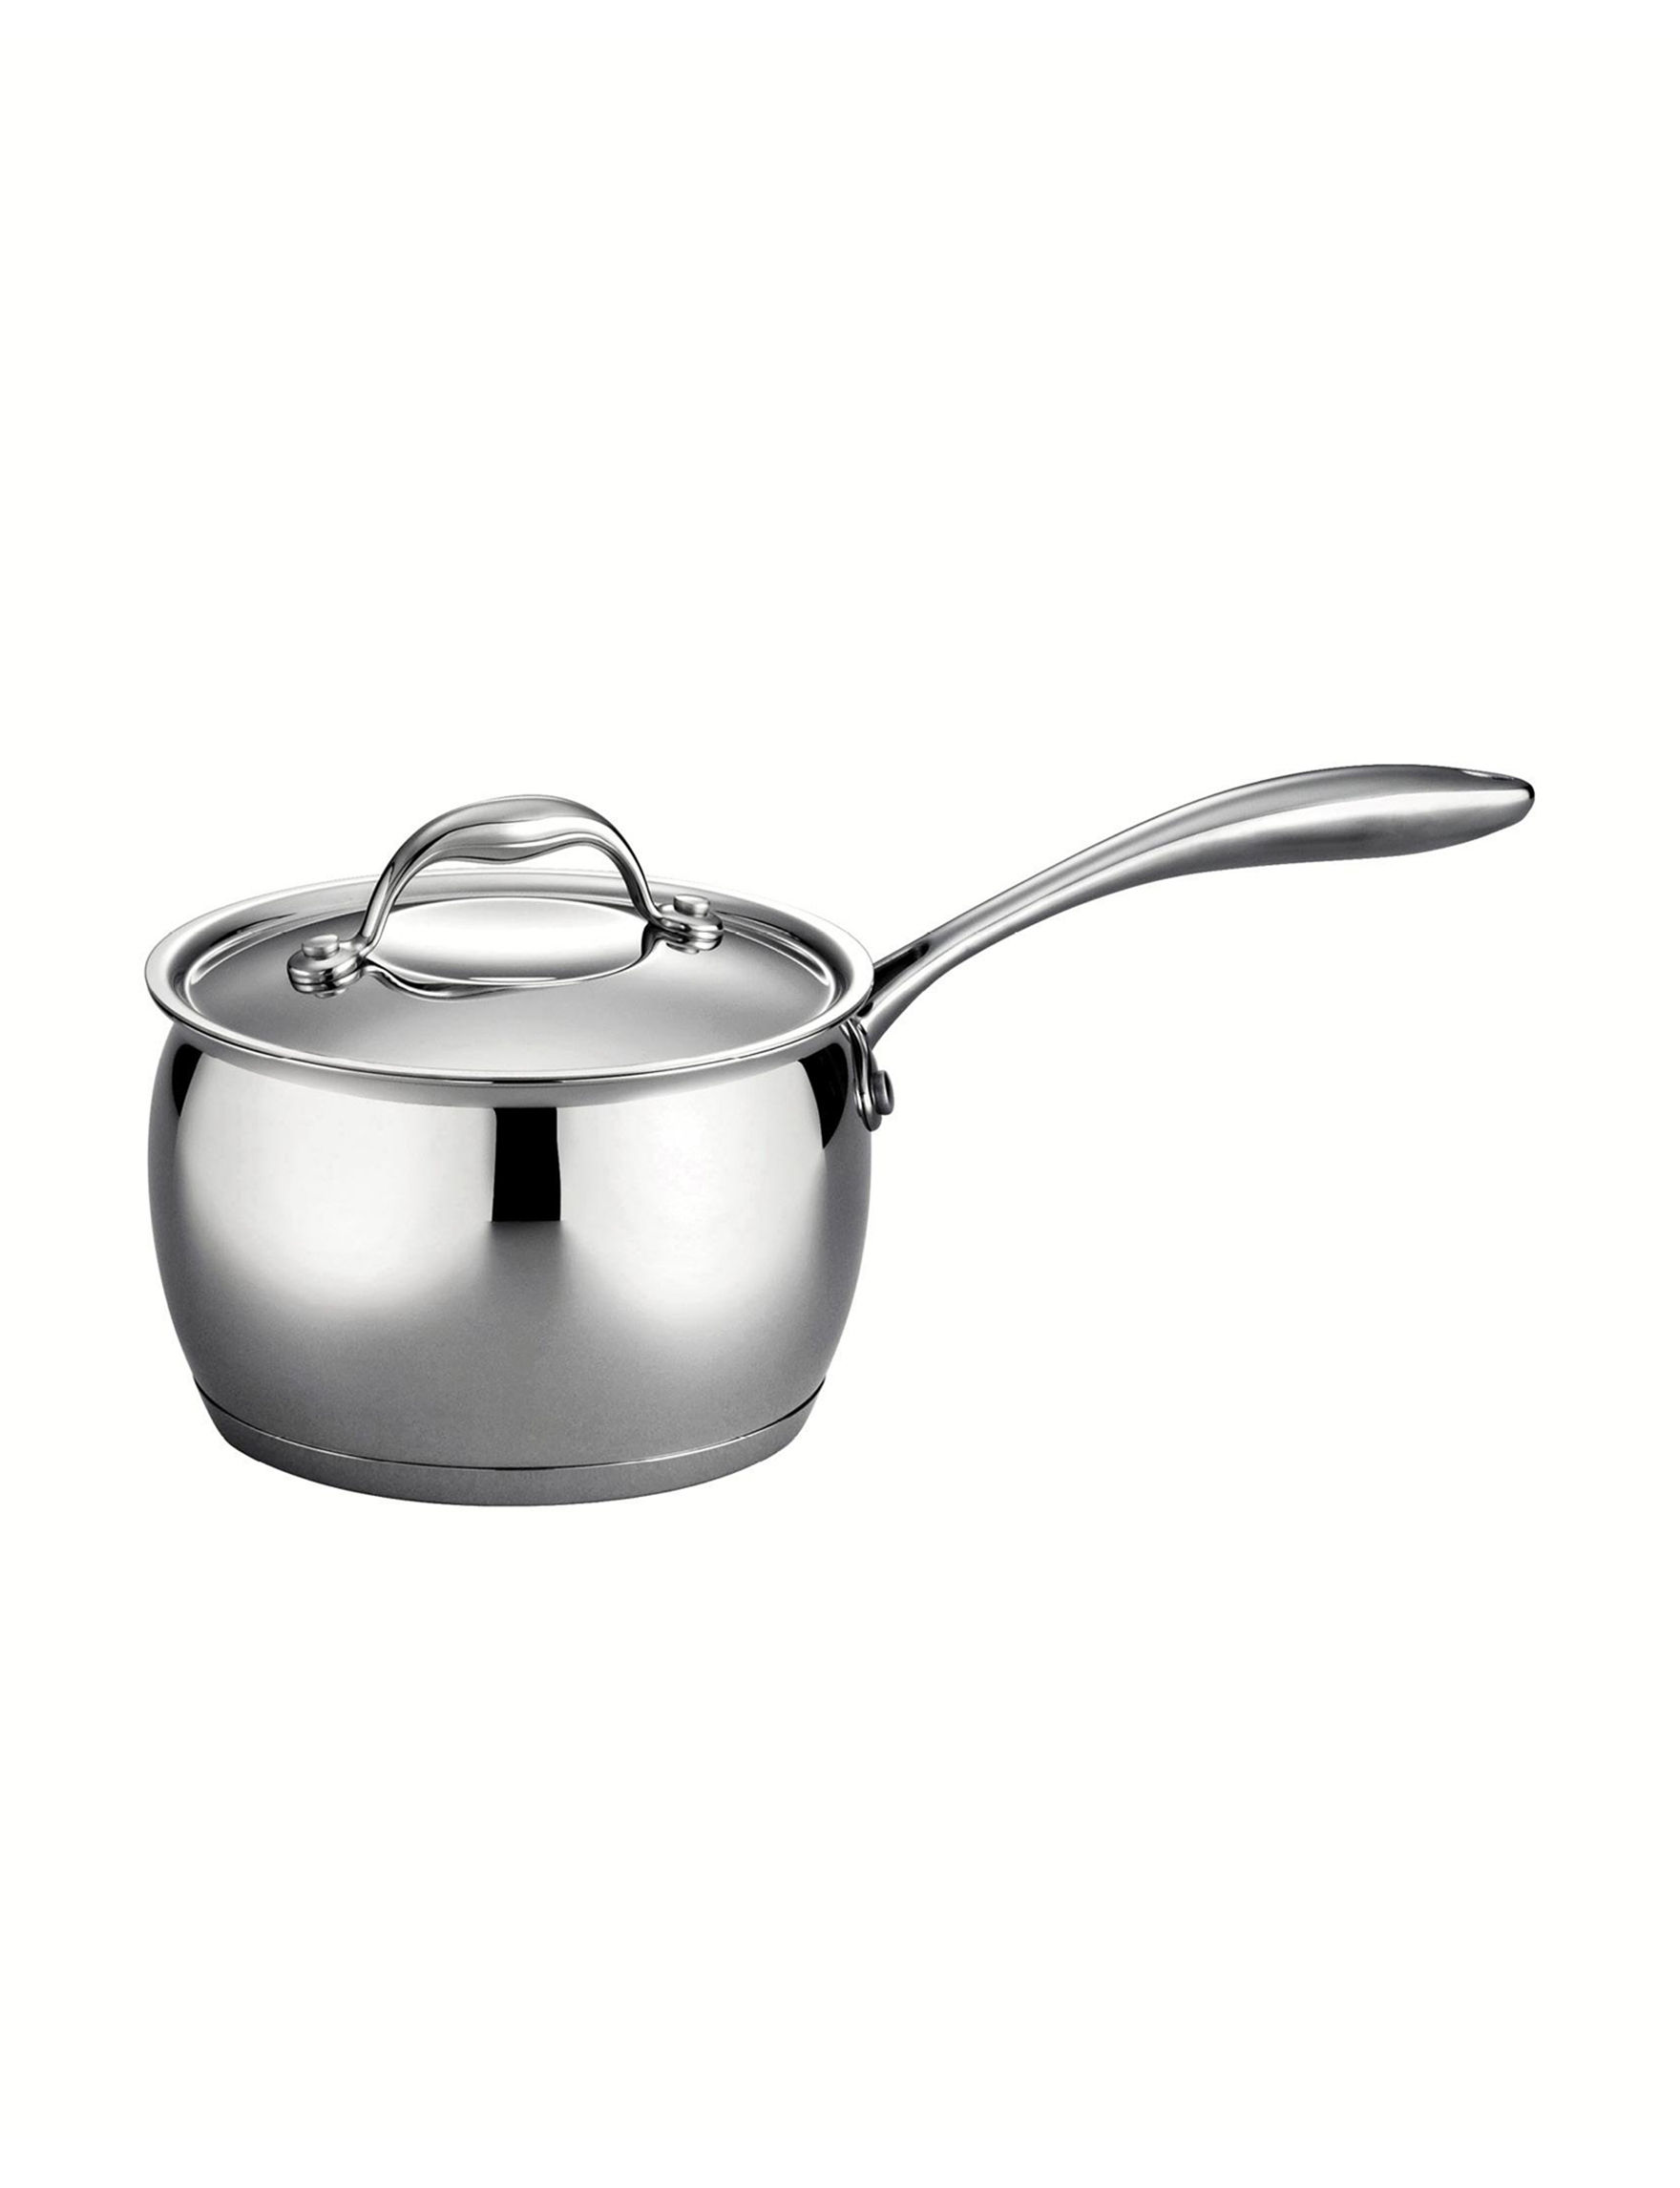 Tramontina Silver Pots & Dutch Ovens Cookware